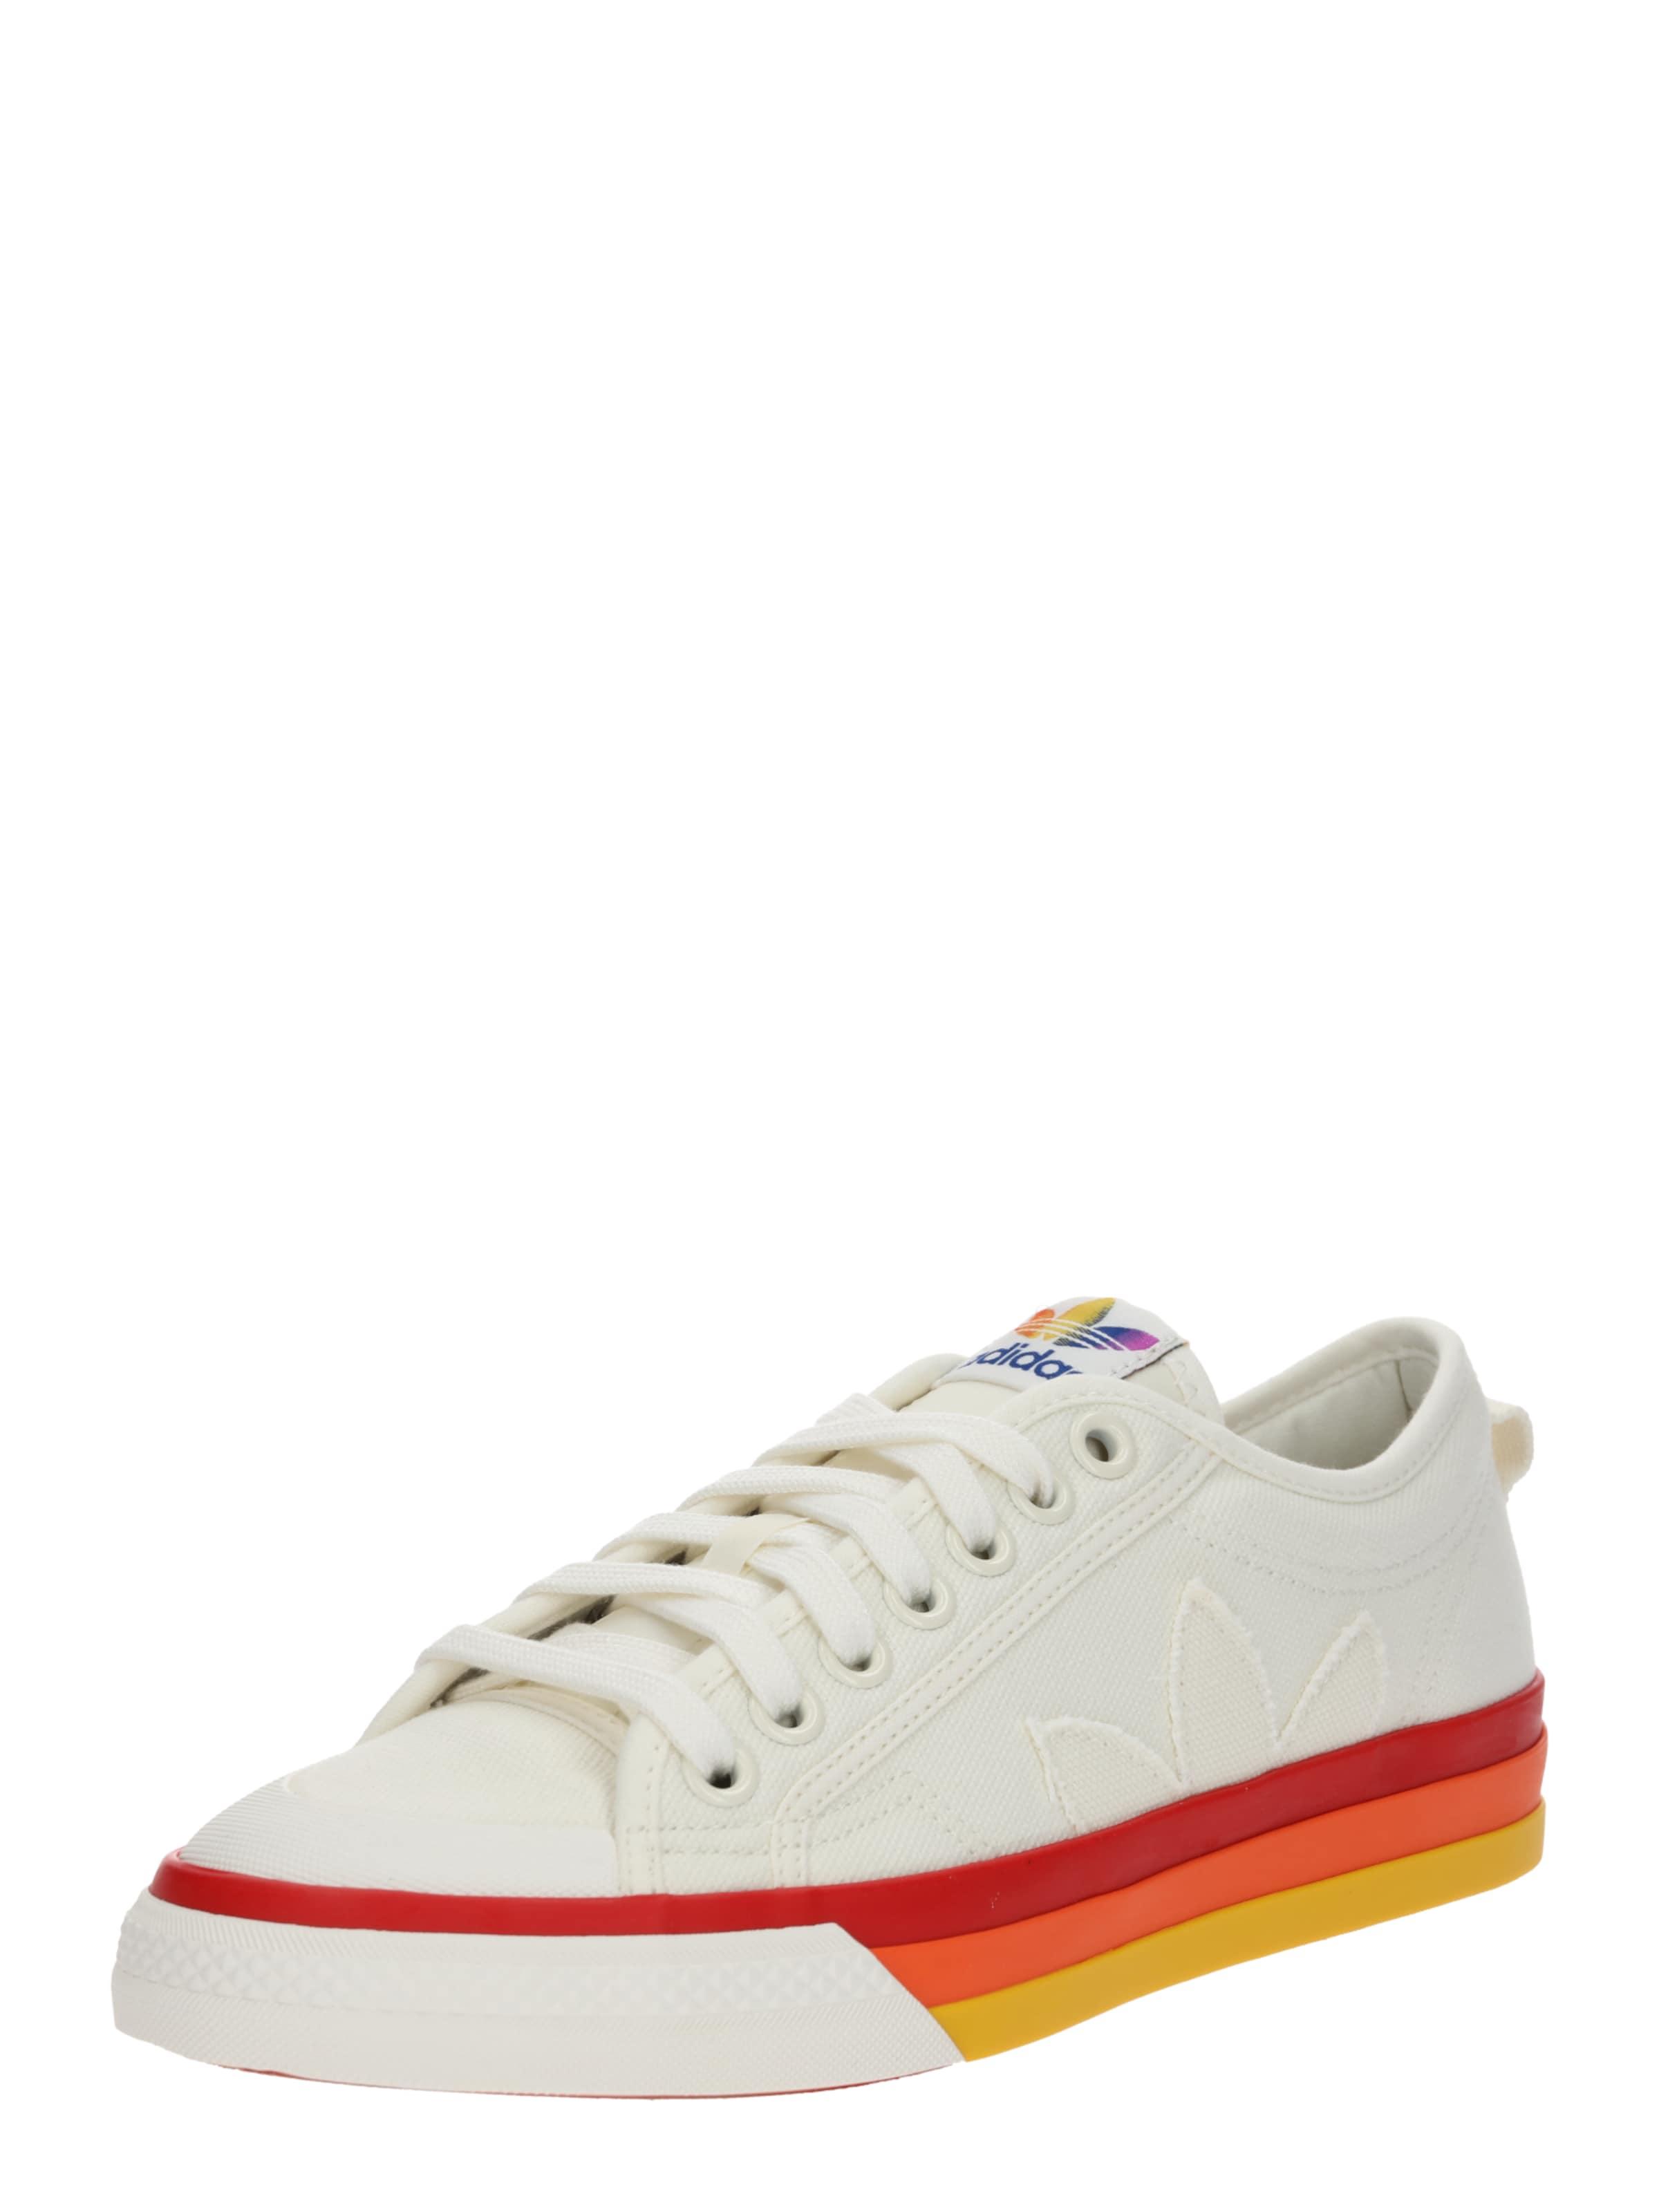 'nizza MischfarbenOffwhite Originals Sneaker Pride' Adidas In kiXZuPTO